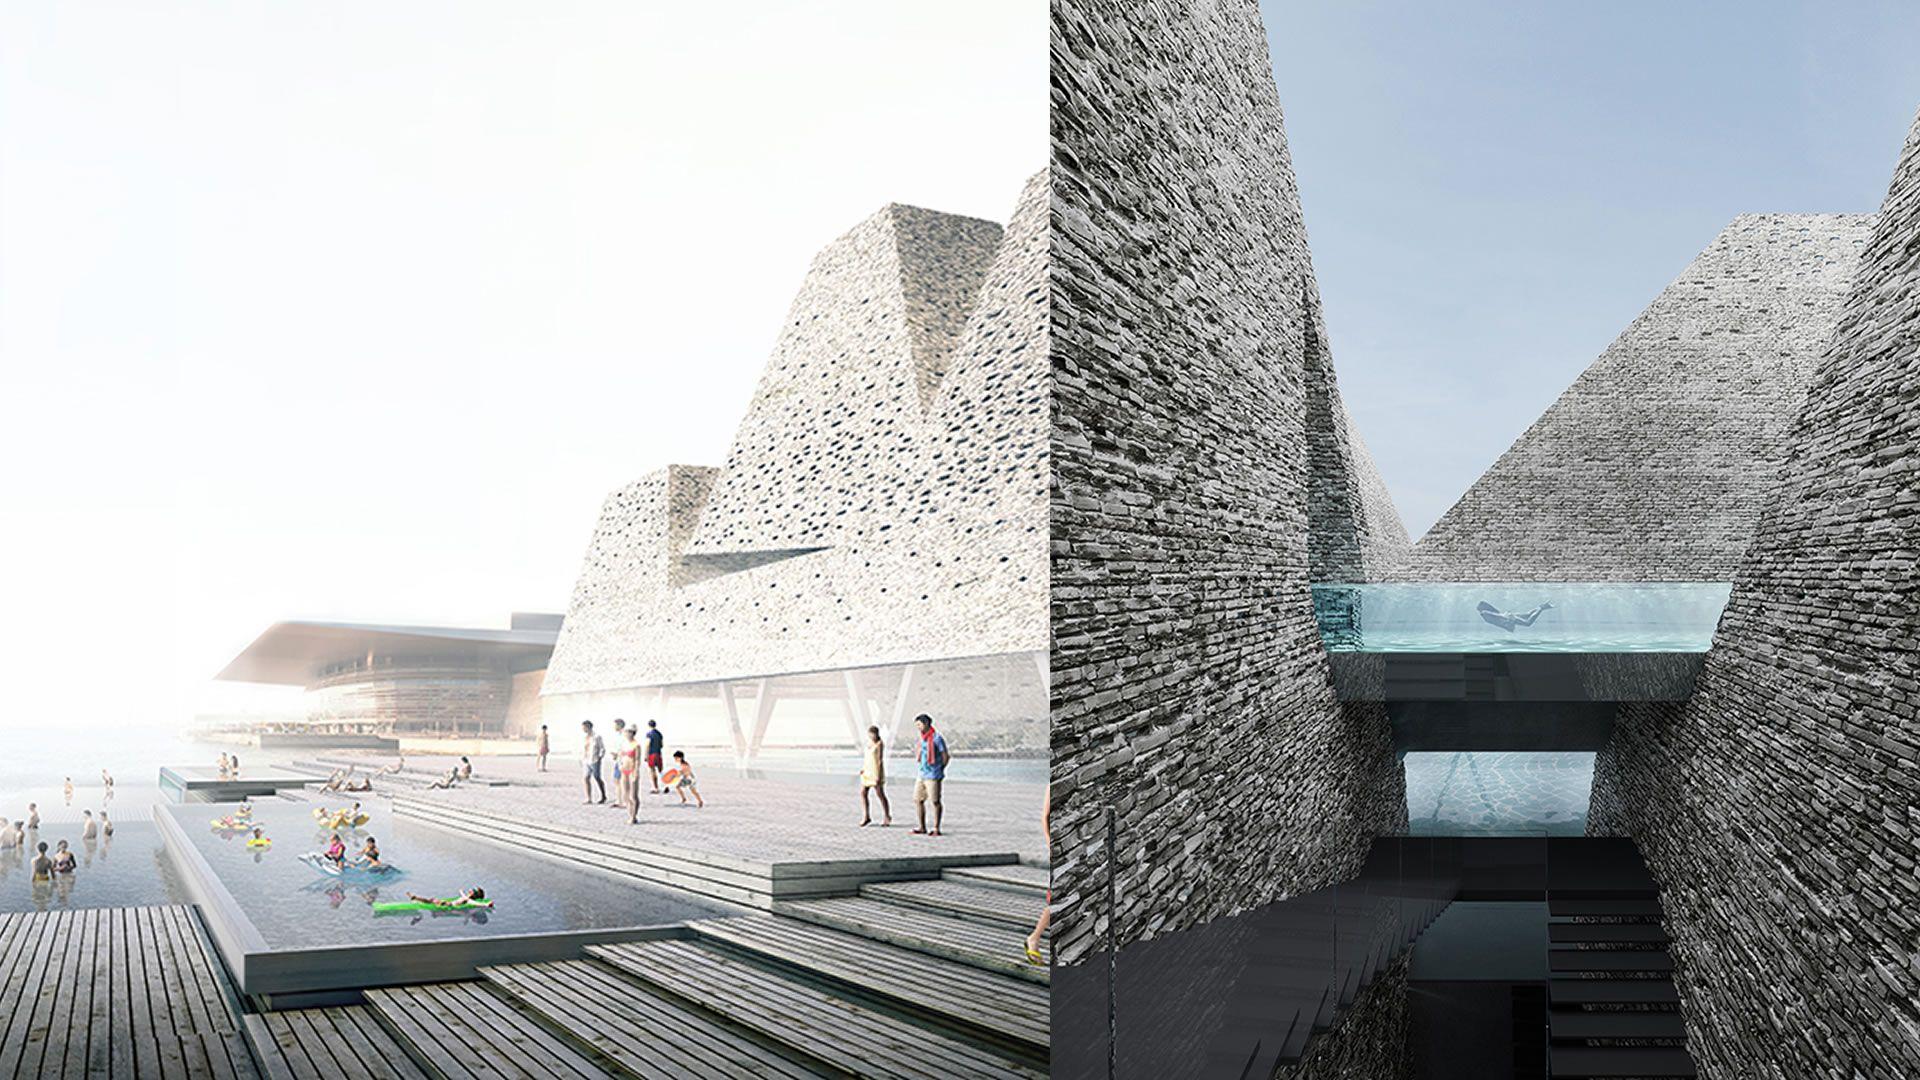 La espectacular piscina pública que construirán en Copenhague